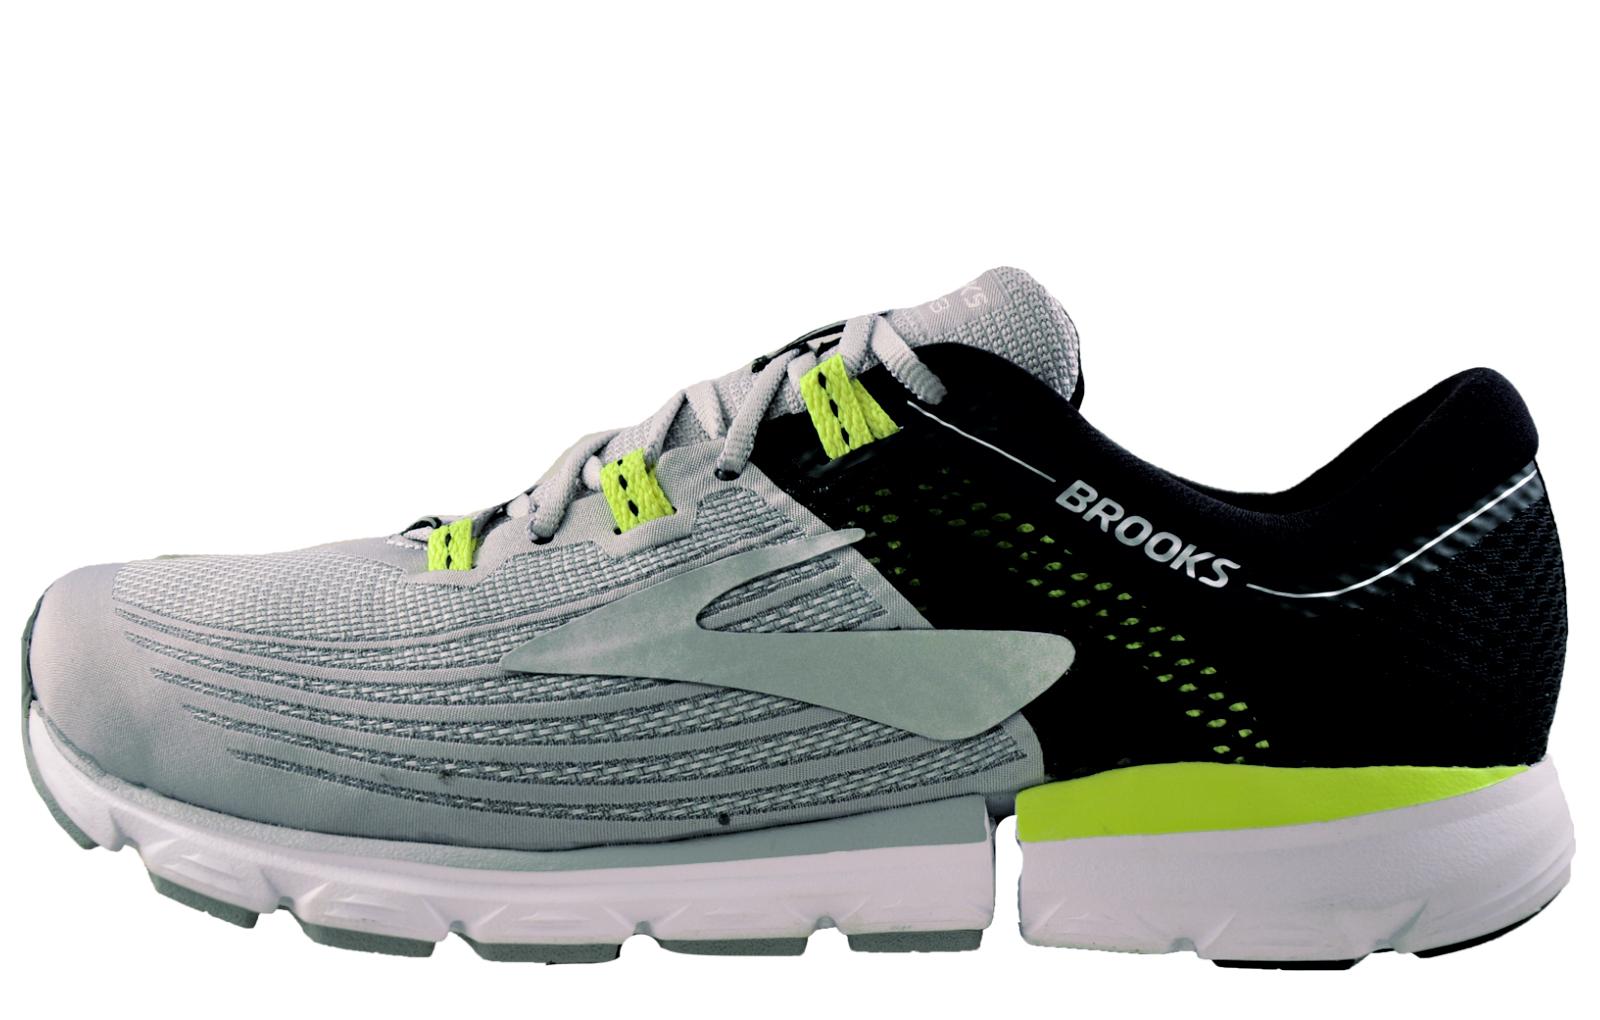 b094a084a40 Brooks Running Shoes